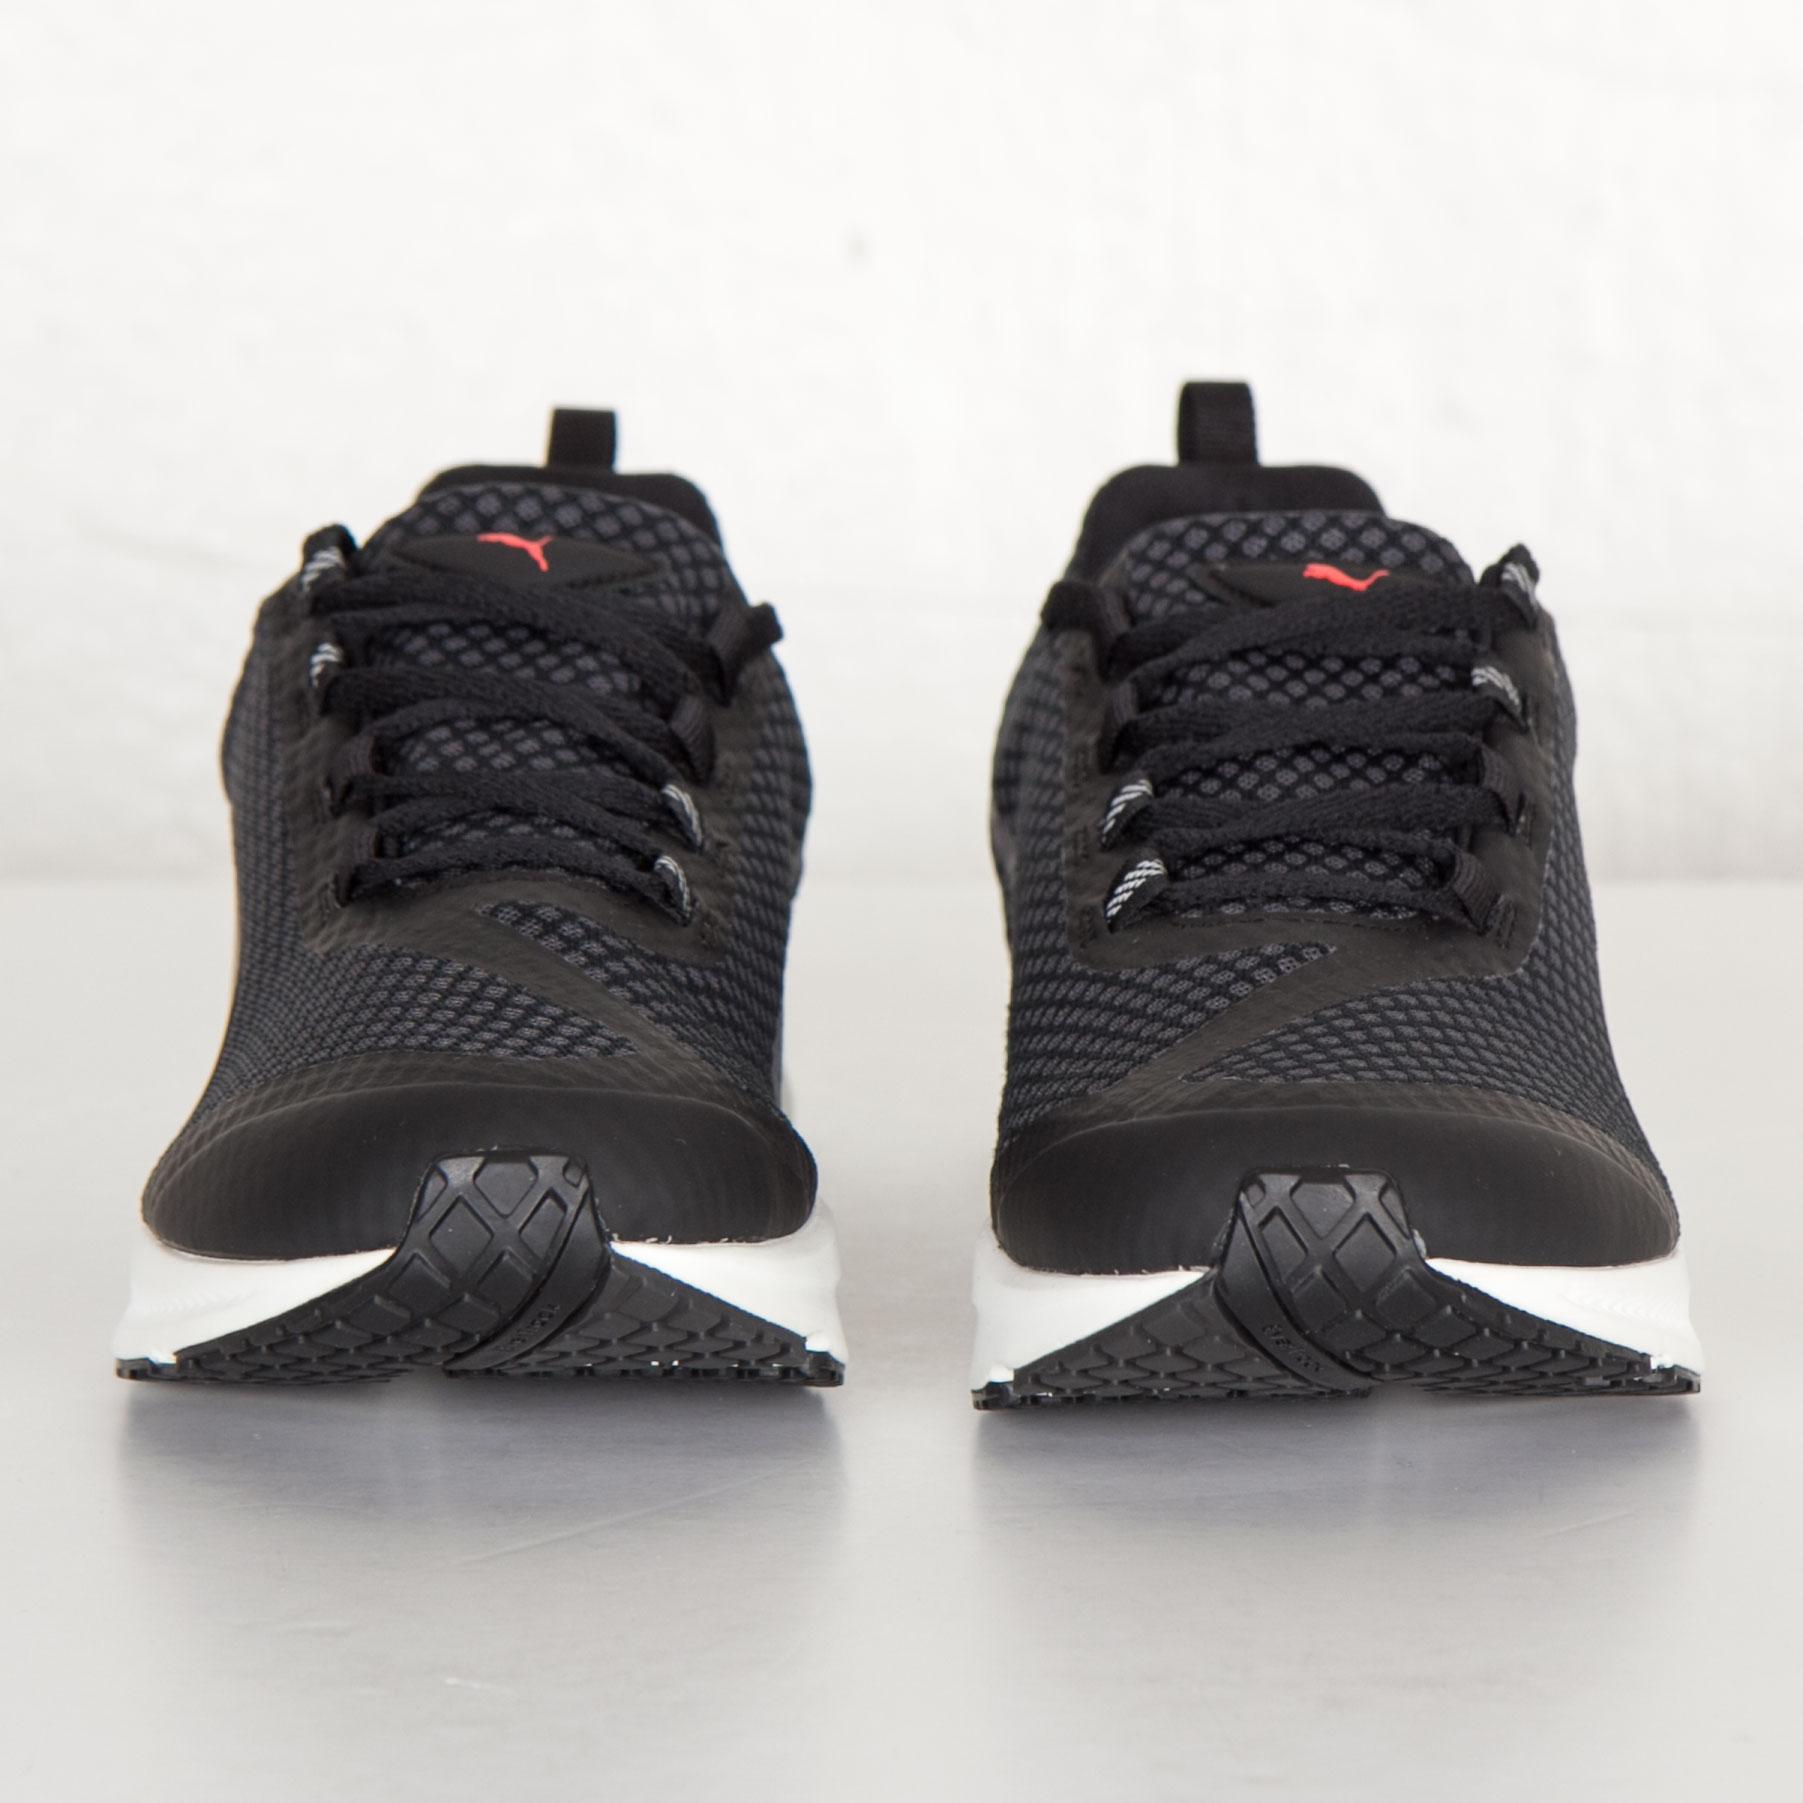 Puma Ignite XT Core 188579 02 Sneakersnstuff | sneakers